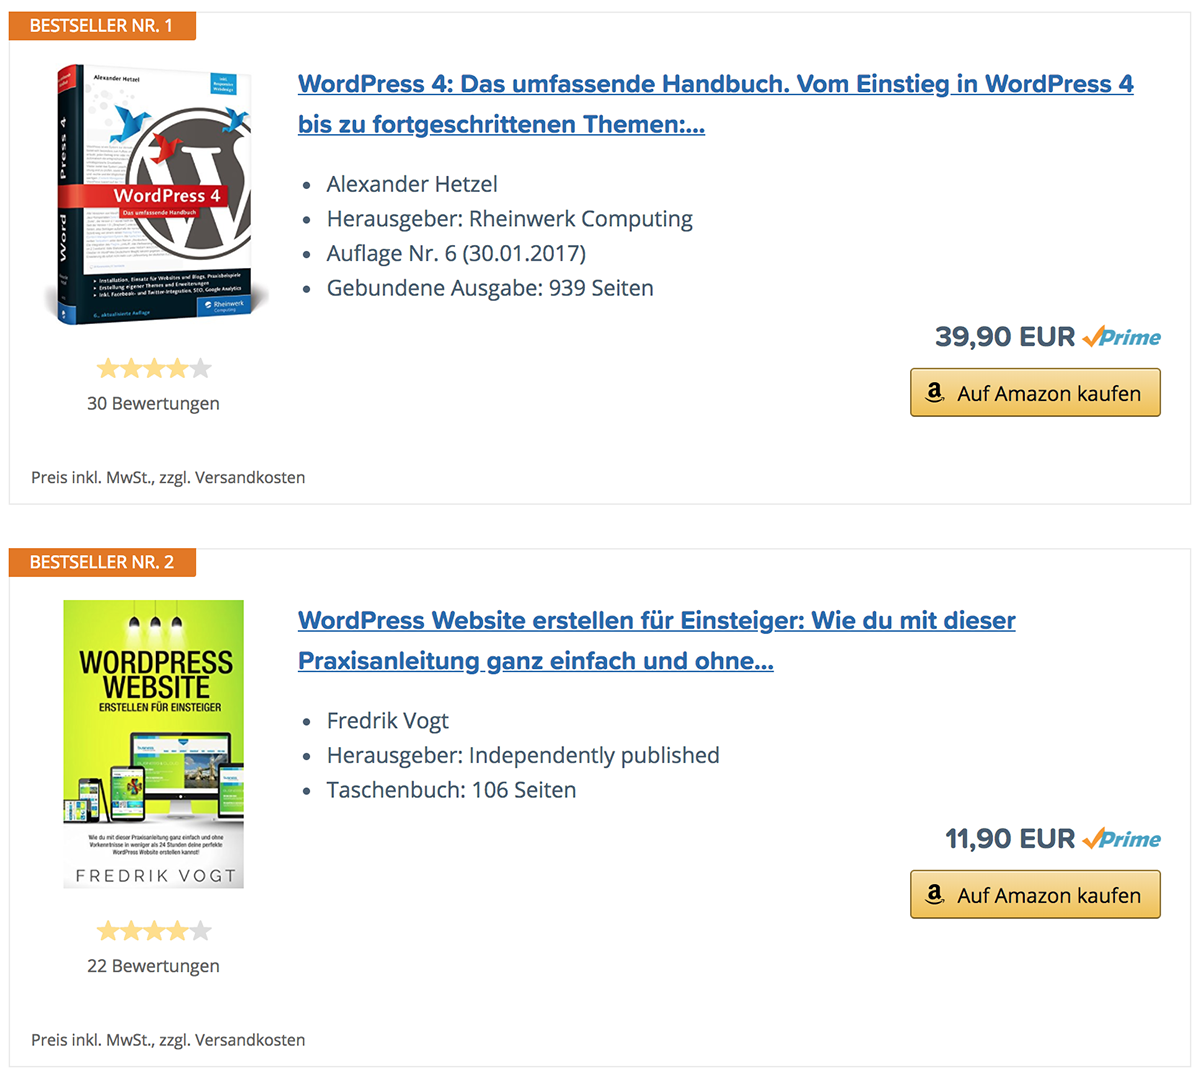 Bestseller-Listen aus dem Amazon Affiliate-Plugin AAWP